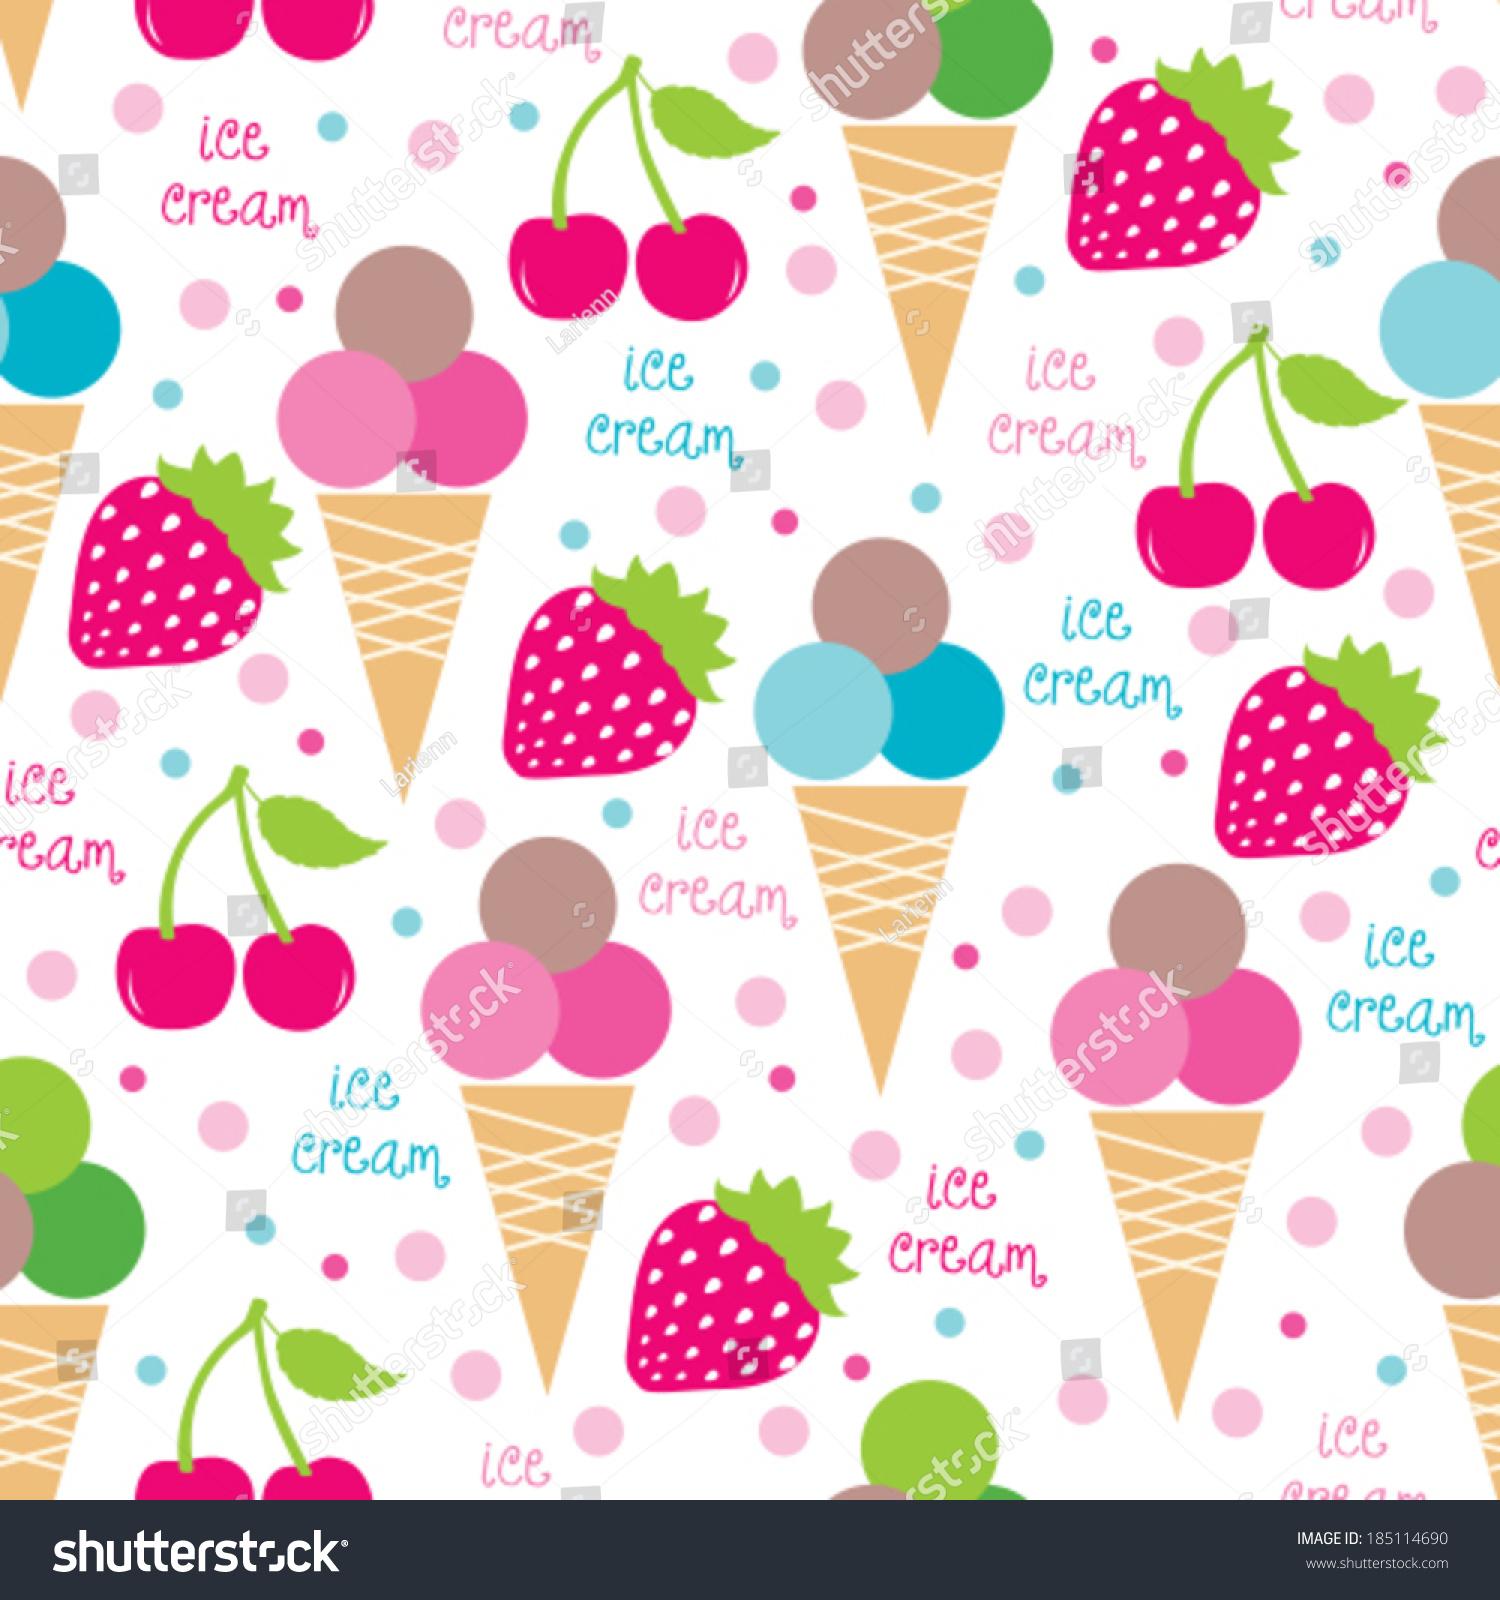 Ice Cream Cones Seamless Pattern Background Stock Vector: Ice Cream Cones And Fruits Seamless Pattern Vector